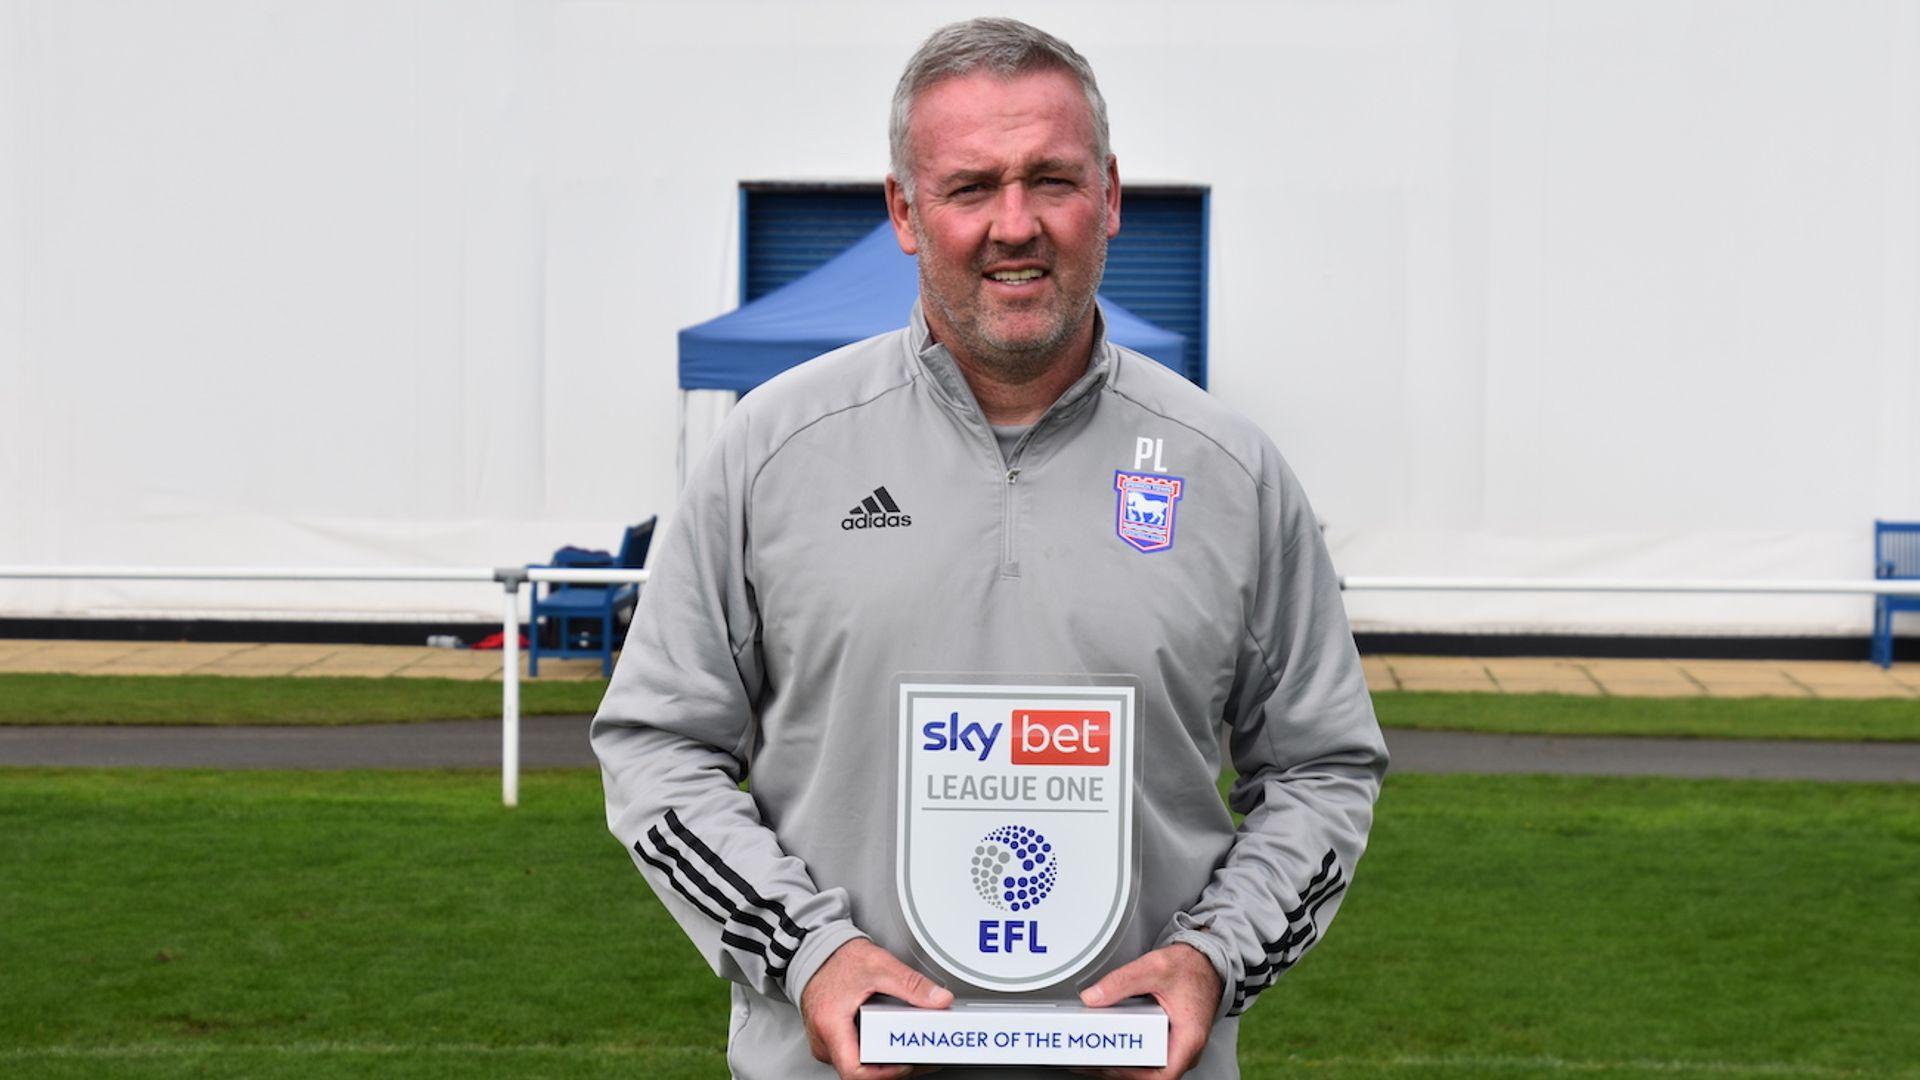 Lambert: Without fans it's not football